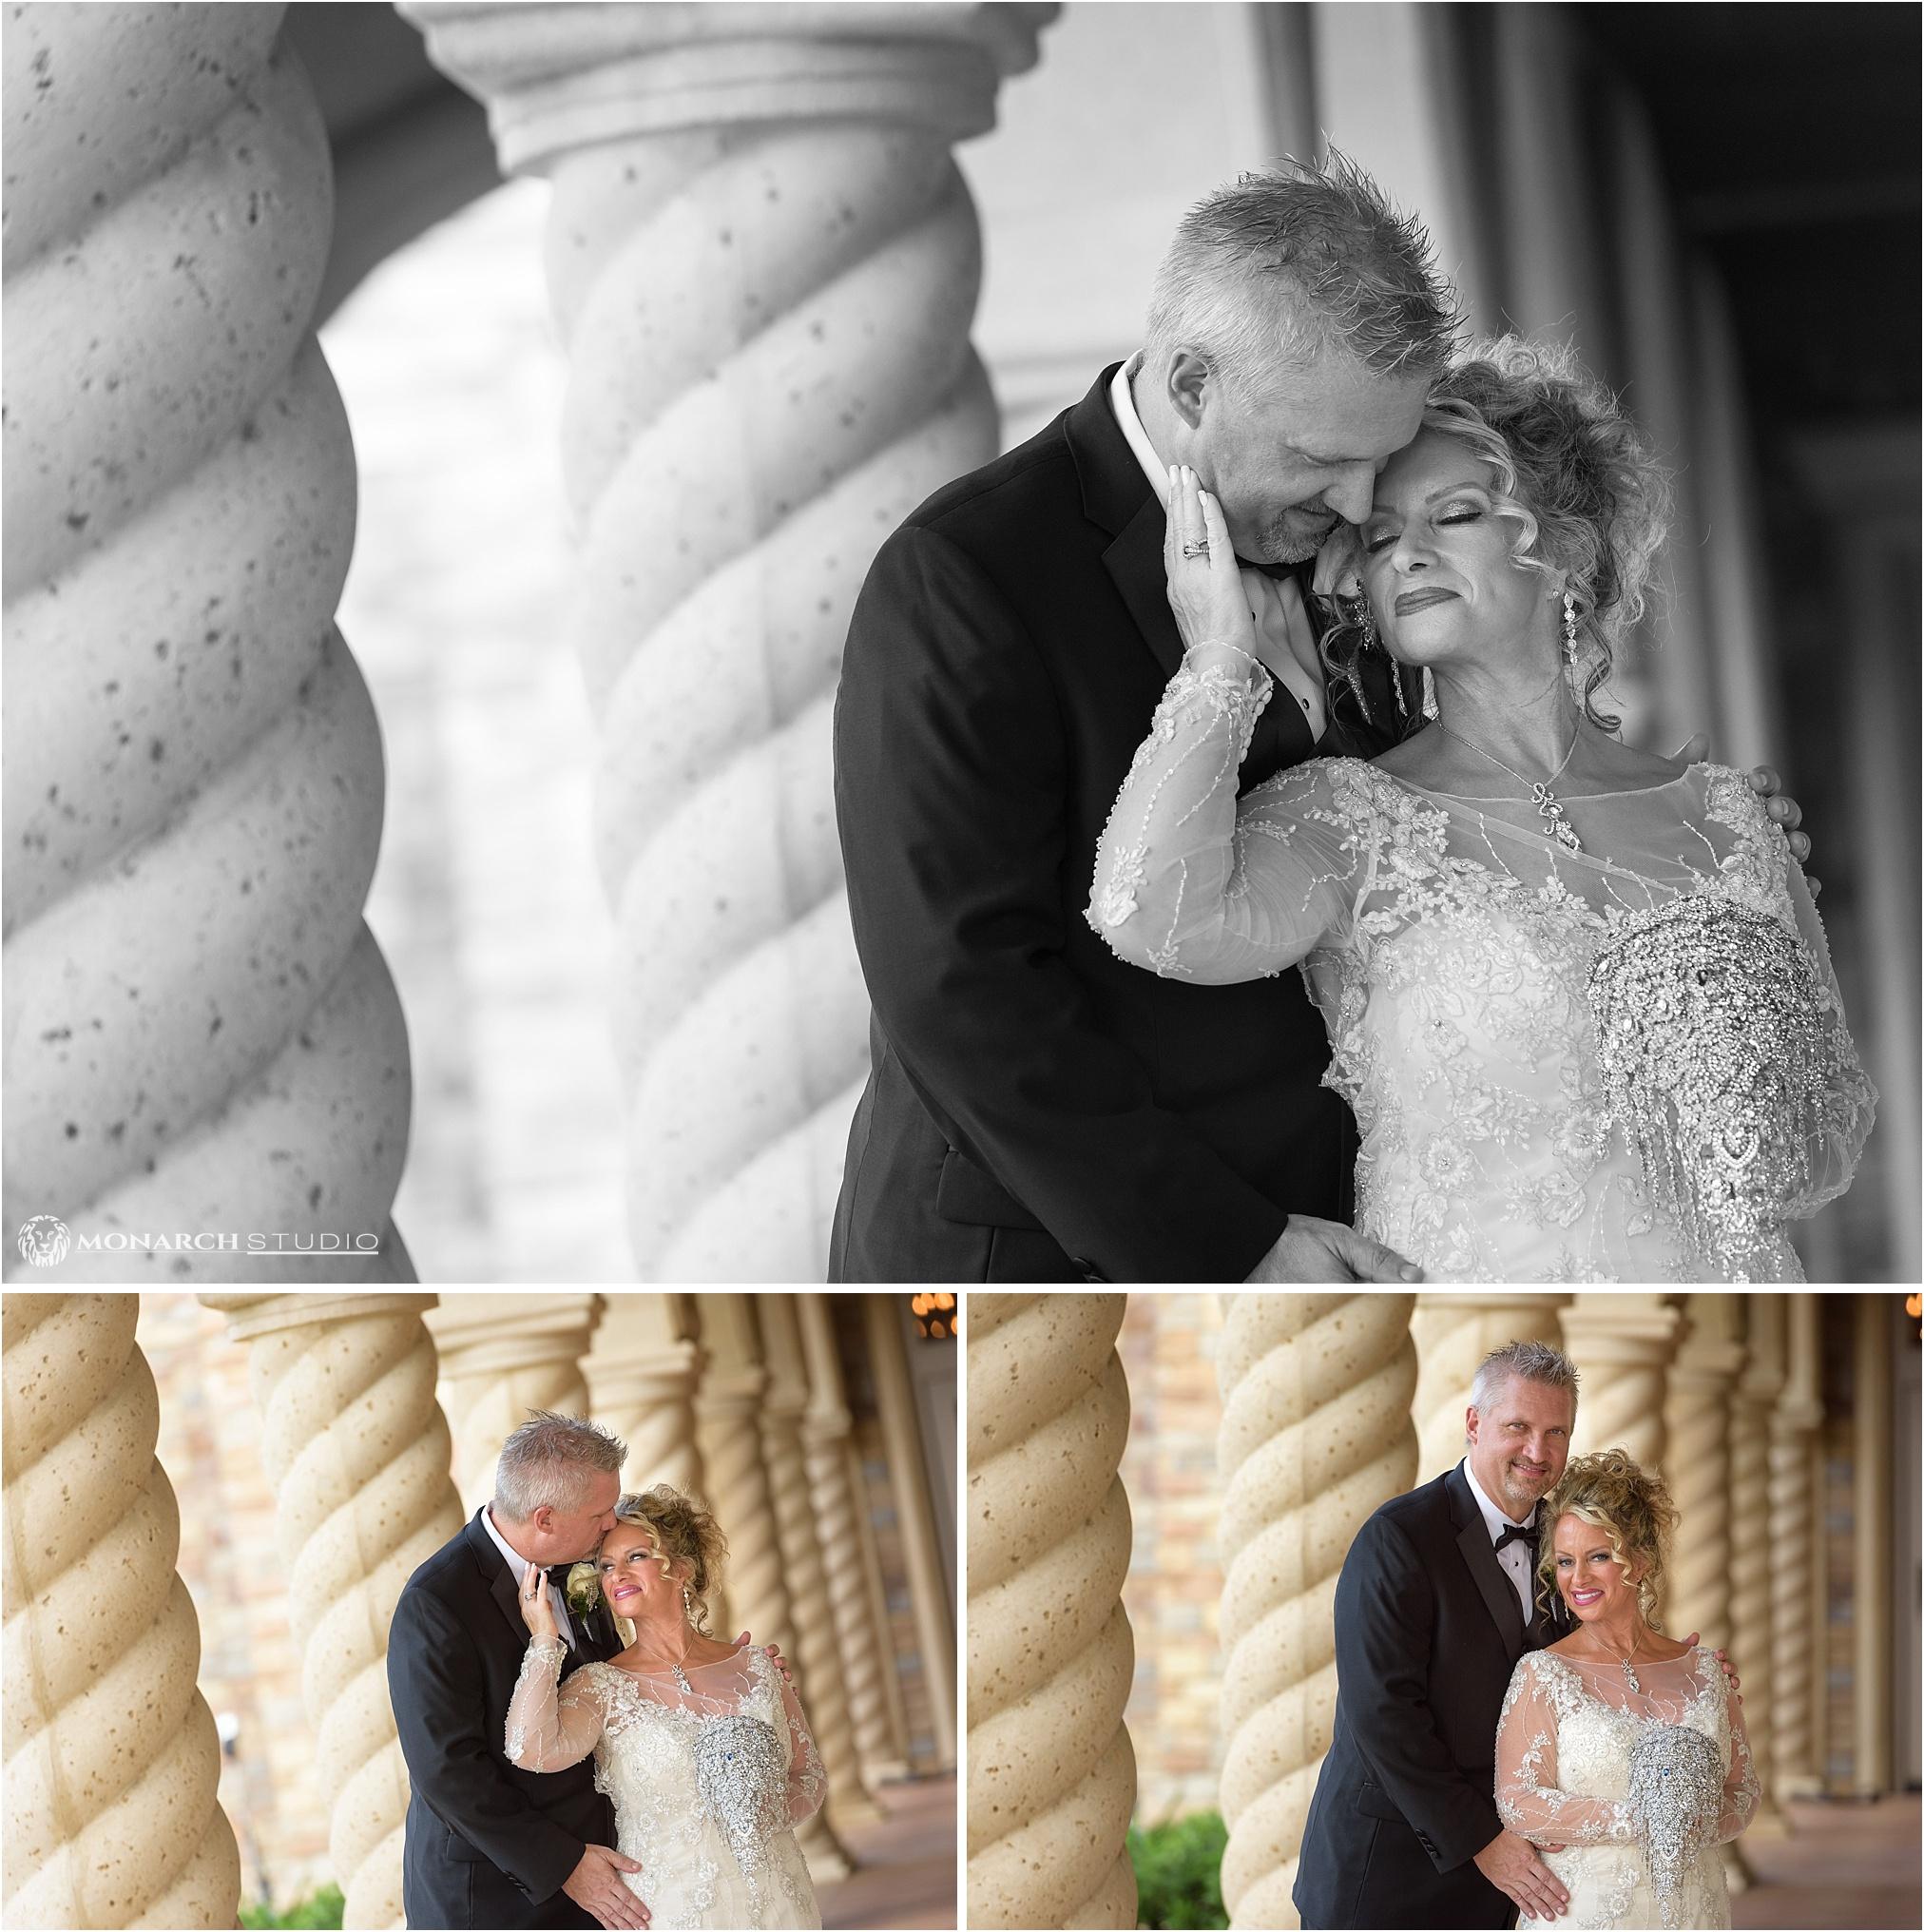 ponte-vedra-wedding-photographer-tpc027.jpg